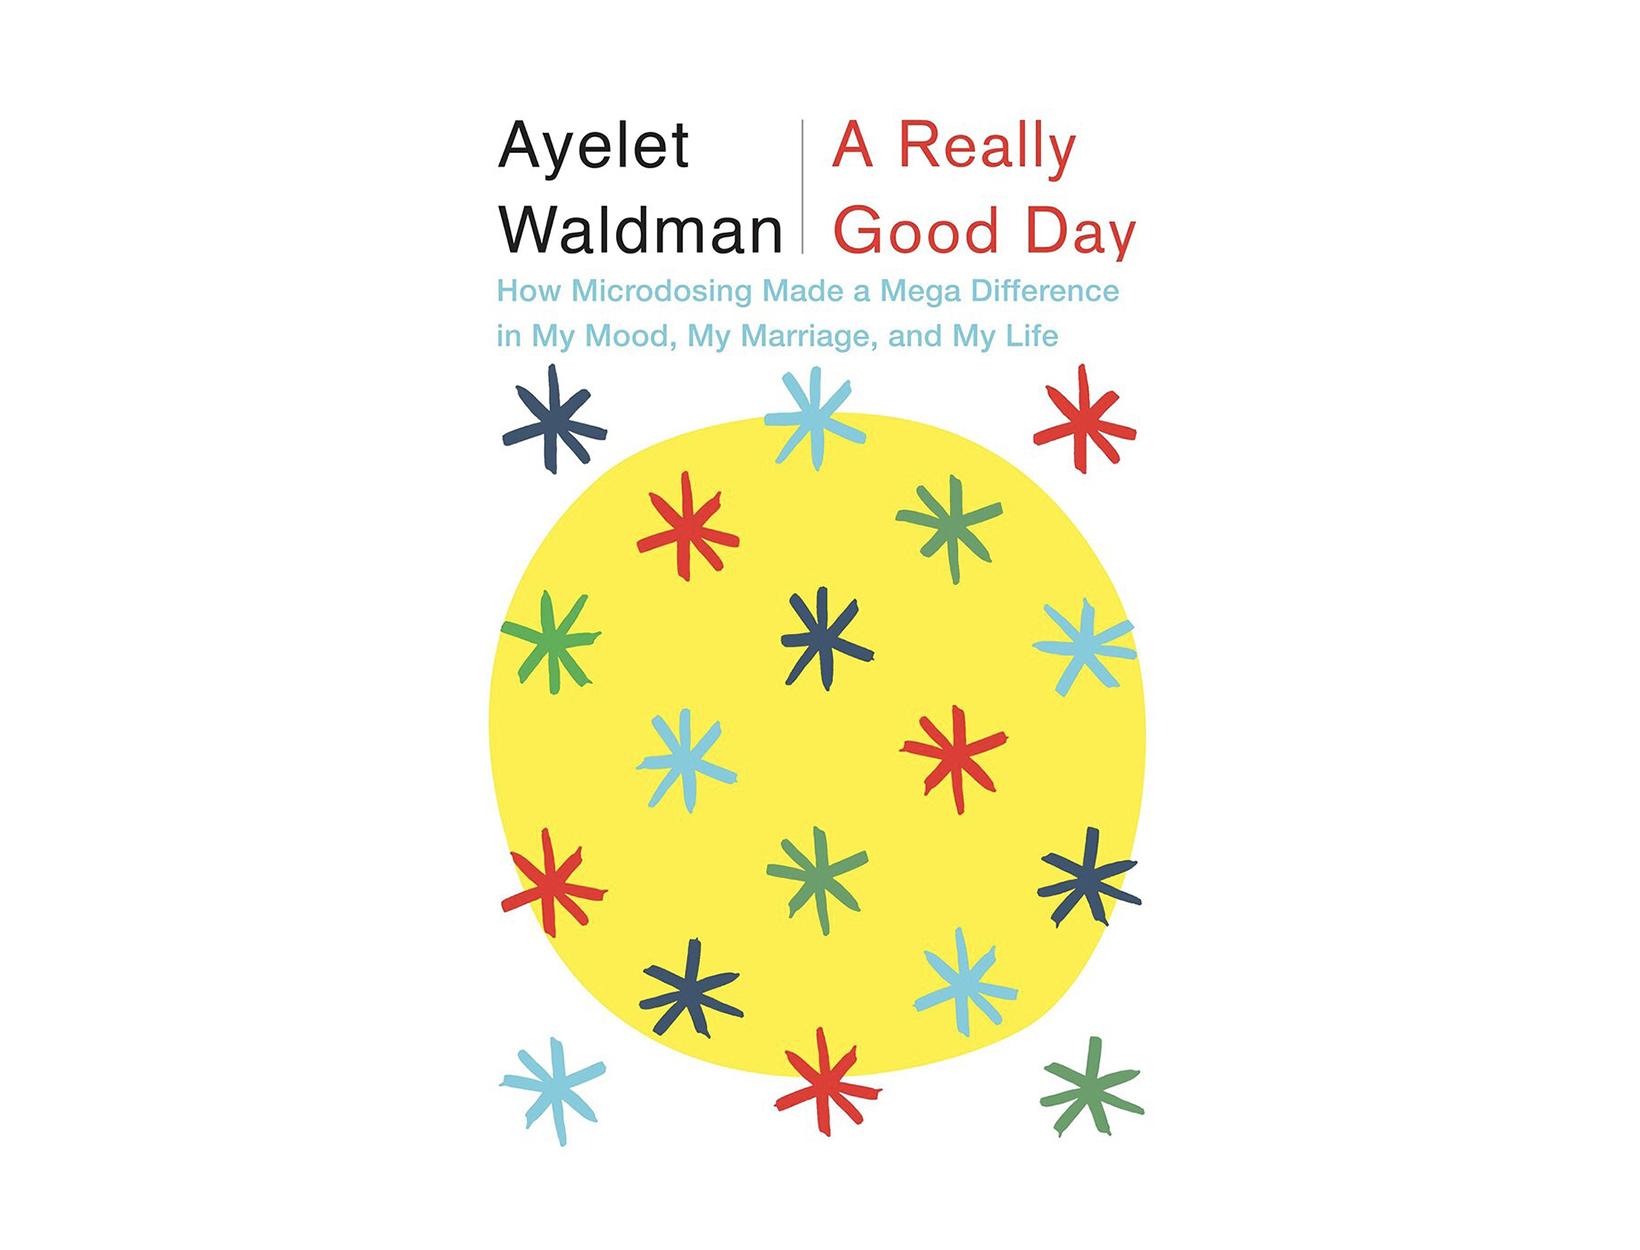 <em>A Really Good Day</em> by Ayelet Waldman